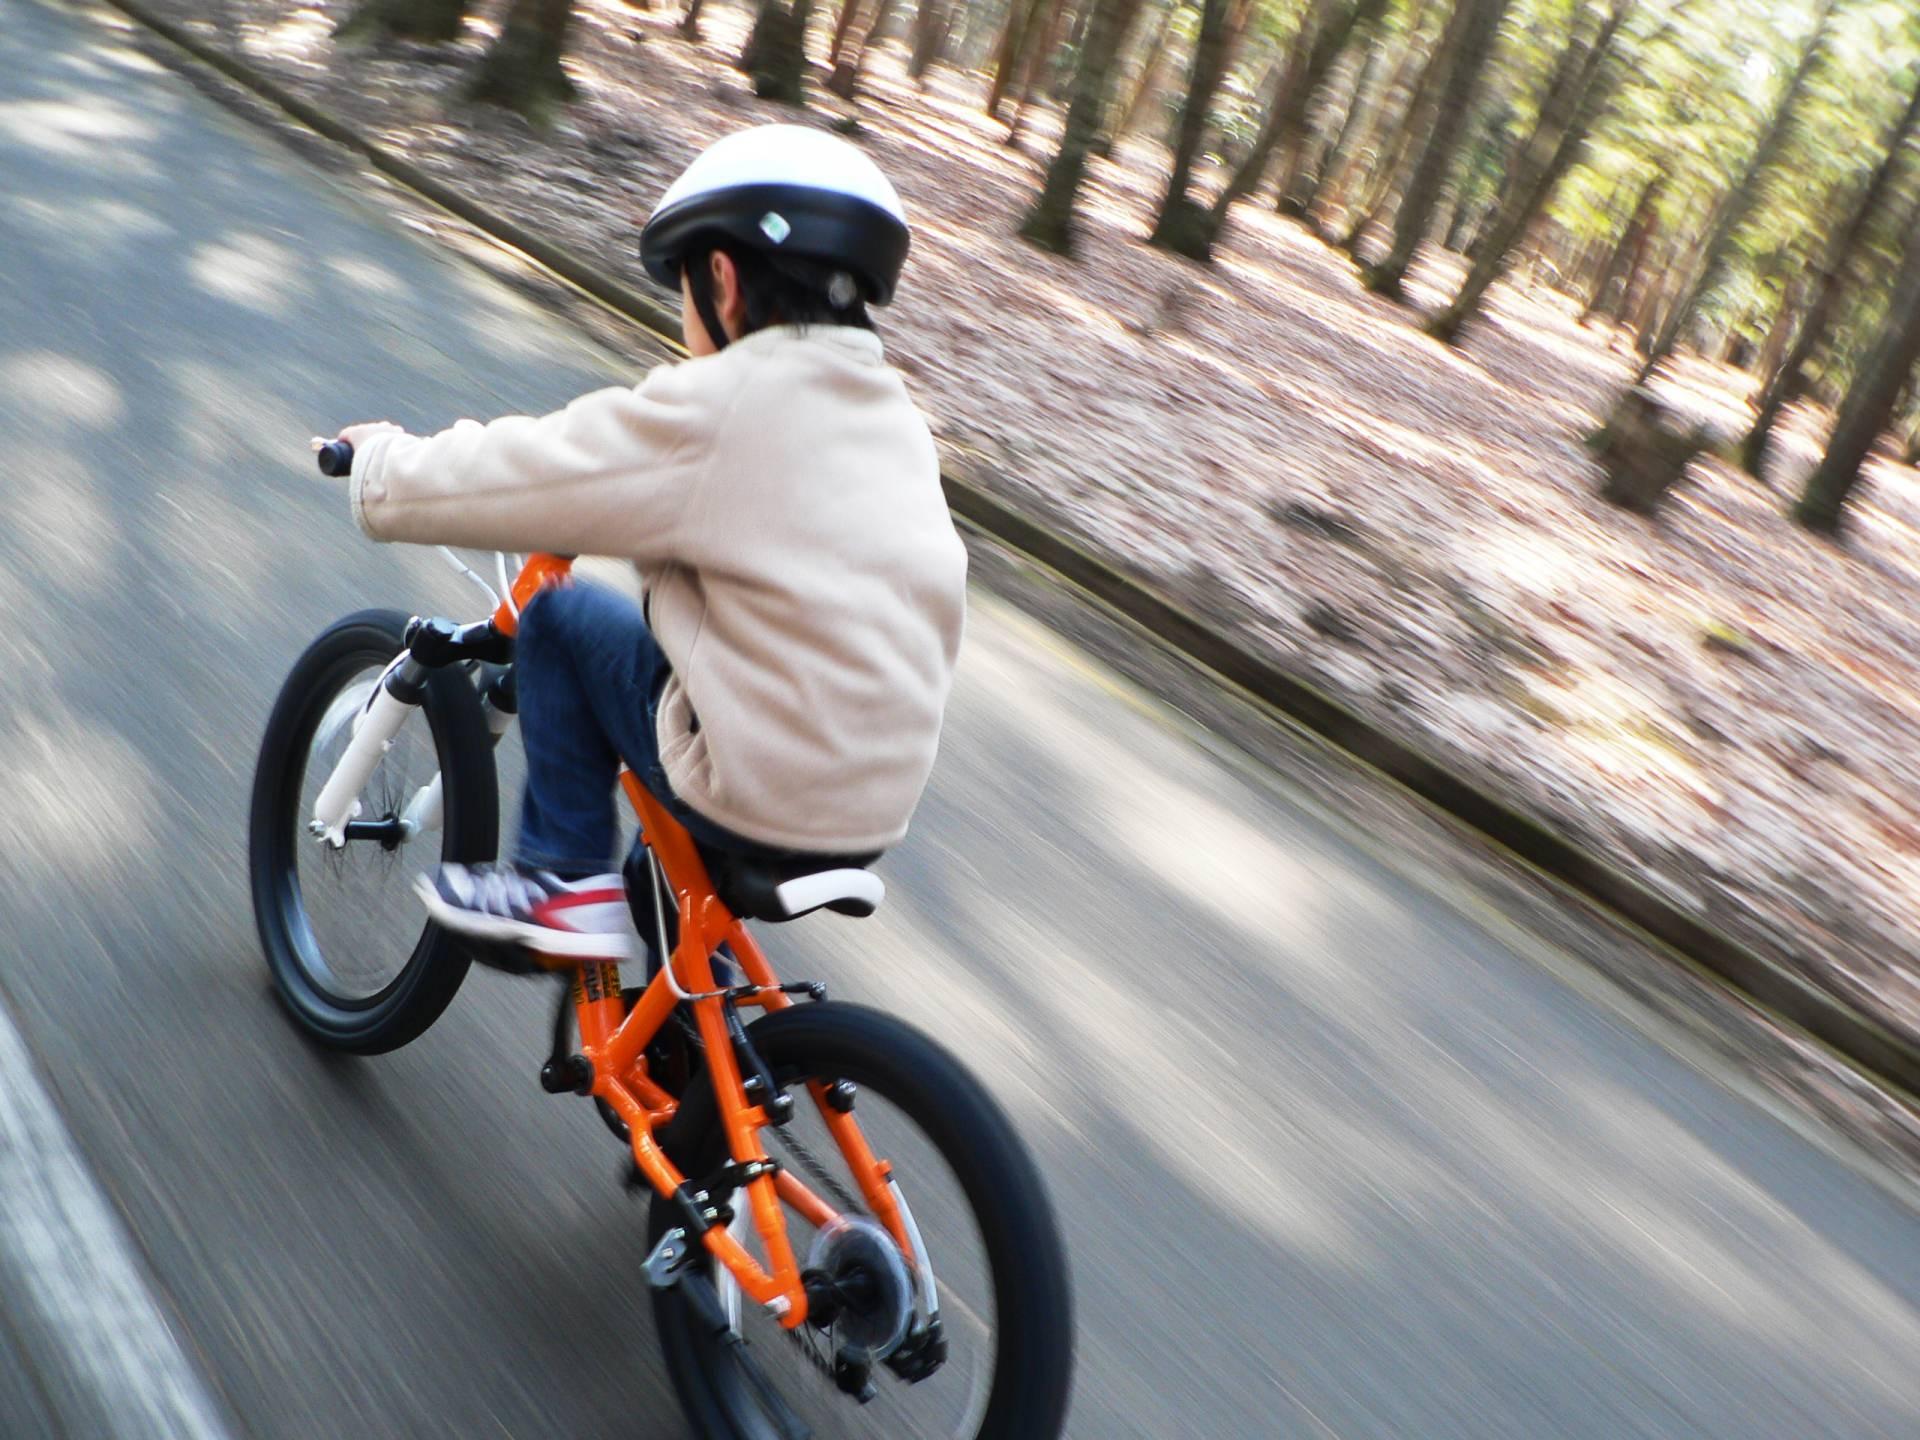 au損保の自転車保険「自転車向け保険 Bycle」に入りました-Japan Nomad